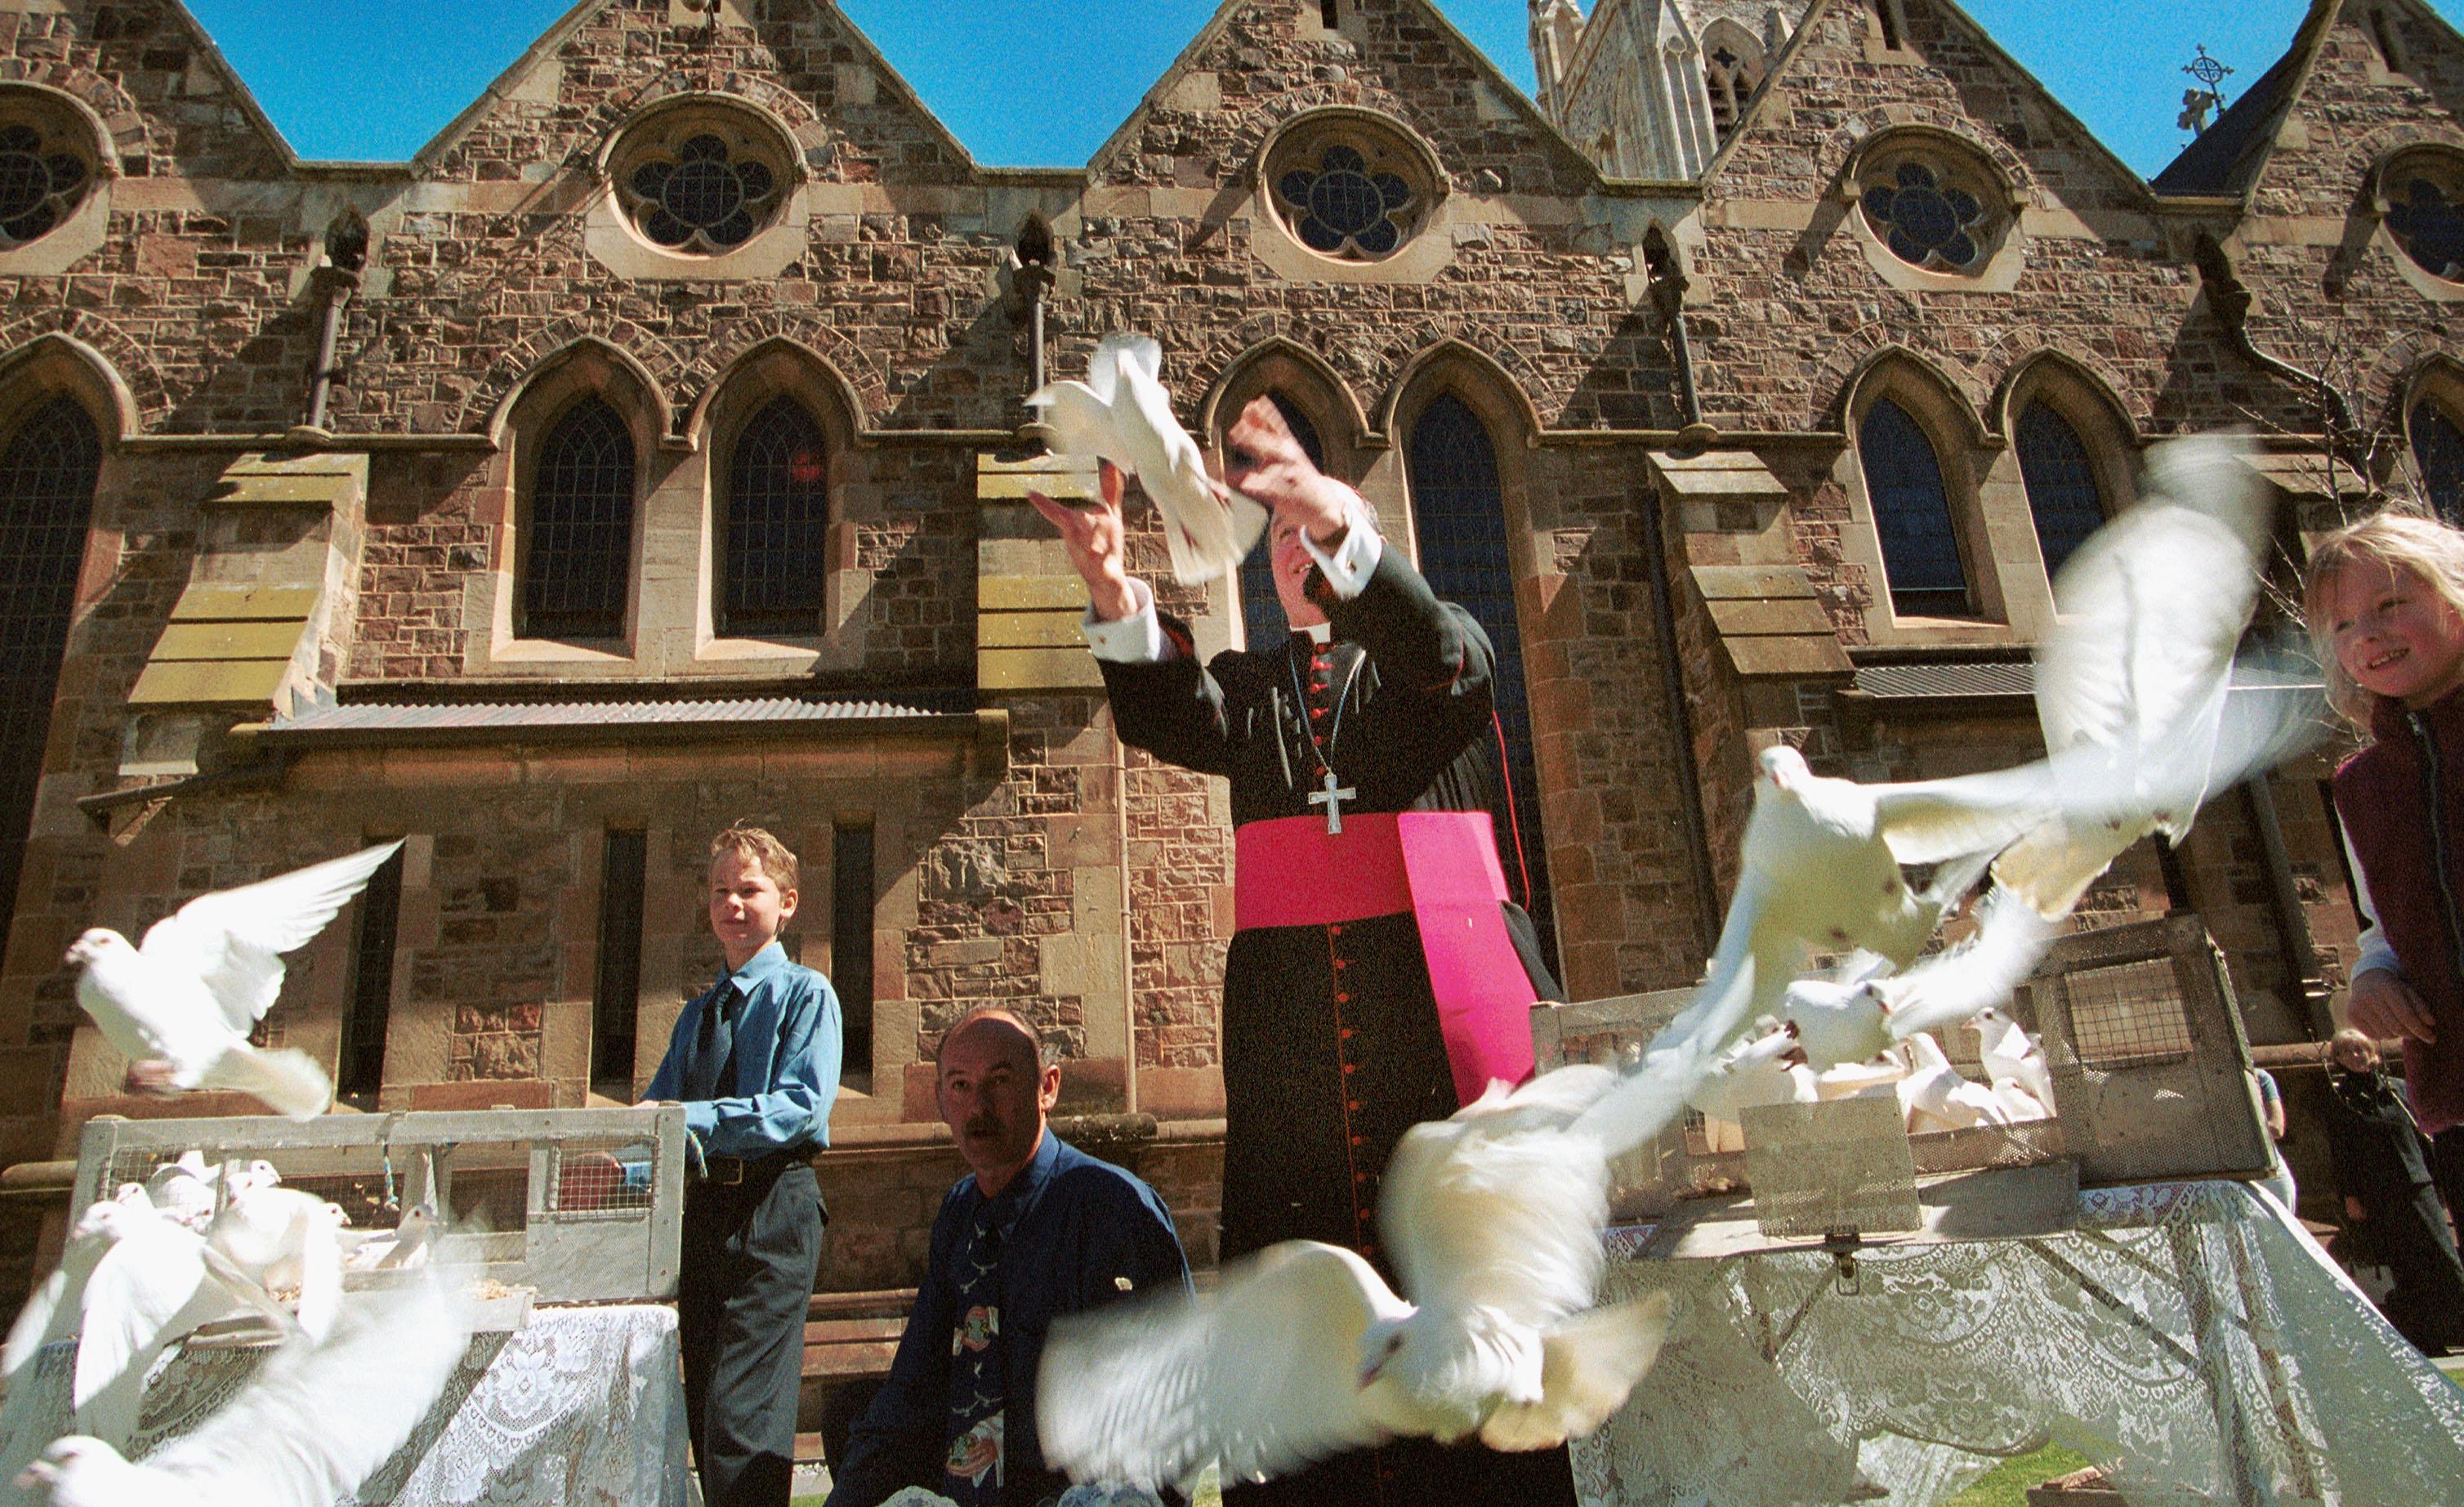 Arhiepiscop australian, găsit vinovat că a protejat un preot care a abuzat sexual 9 copii